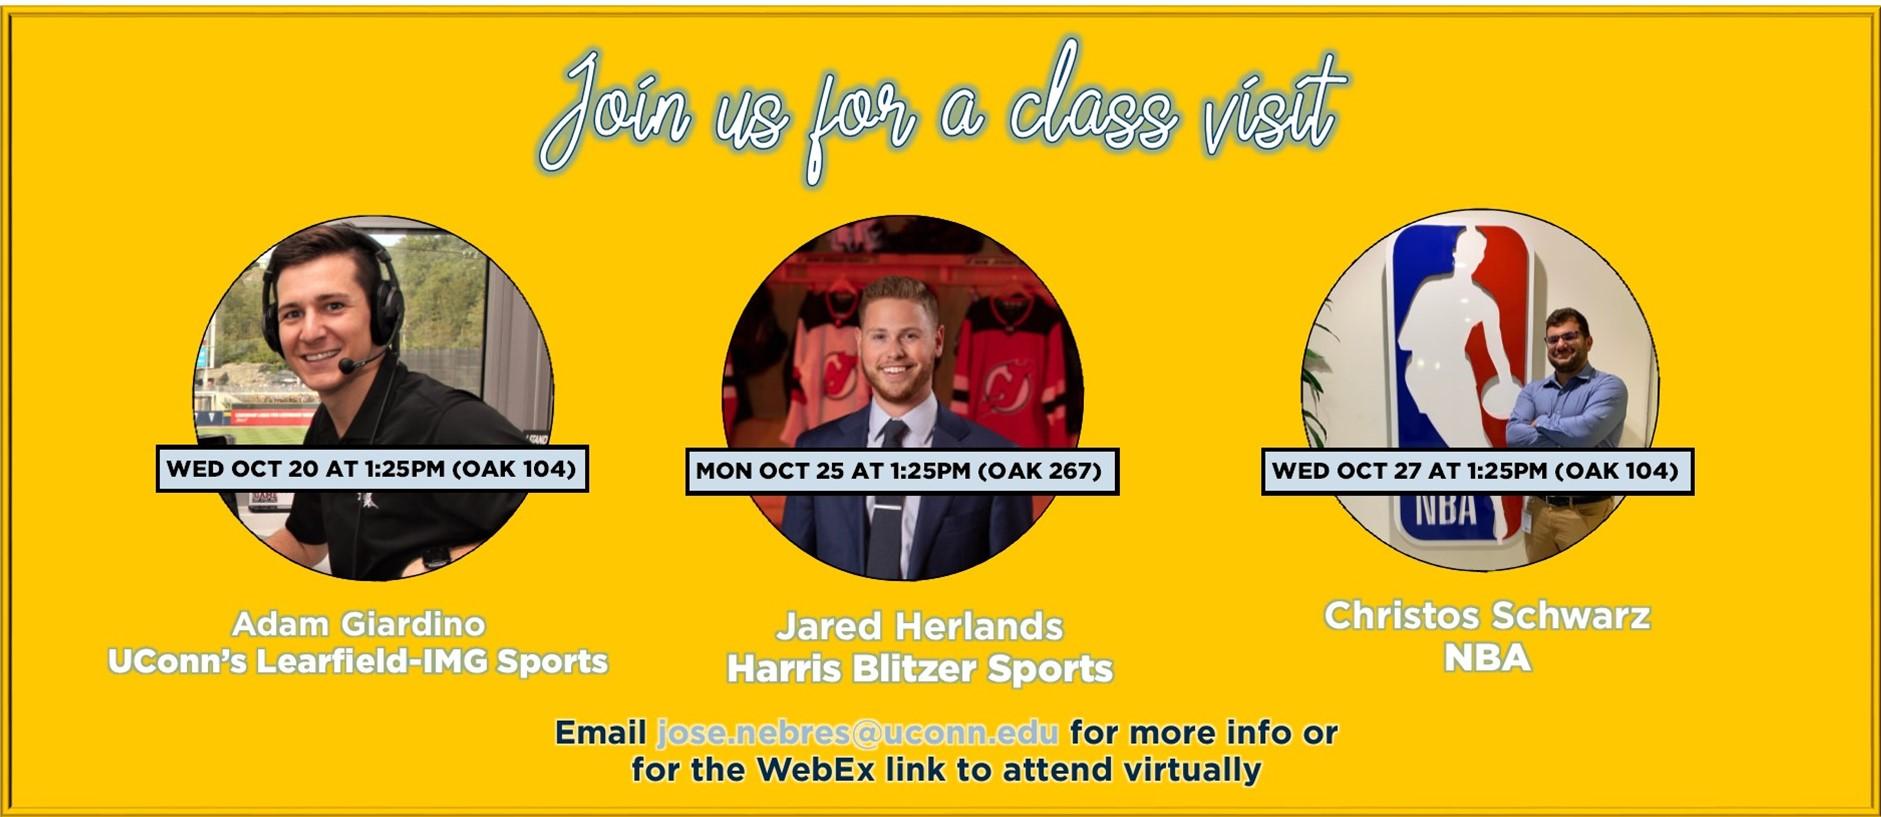 Class visits by alumni on OCT 20 (Adam Giardino) OAK 104; OCT 25 (Jared Herlands) OAK 267; OCT 27 (Christos Schwarz) Oak 104.  All visits at 1:25pm